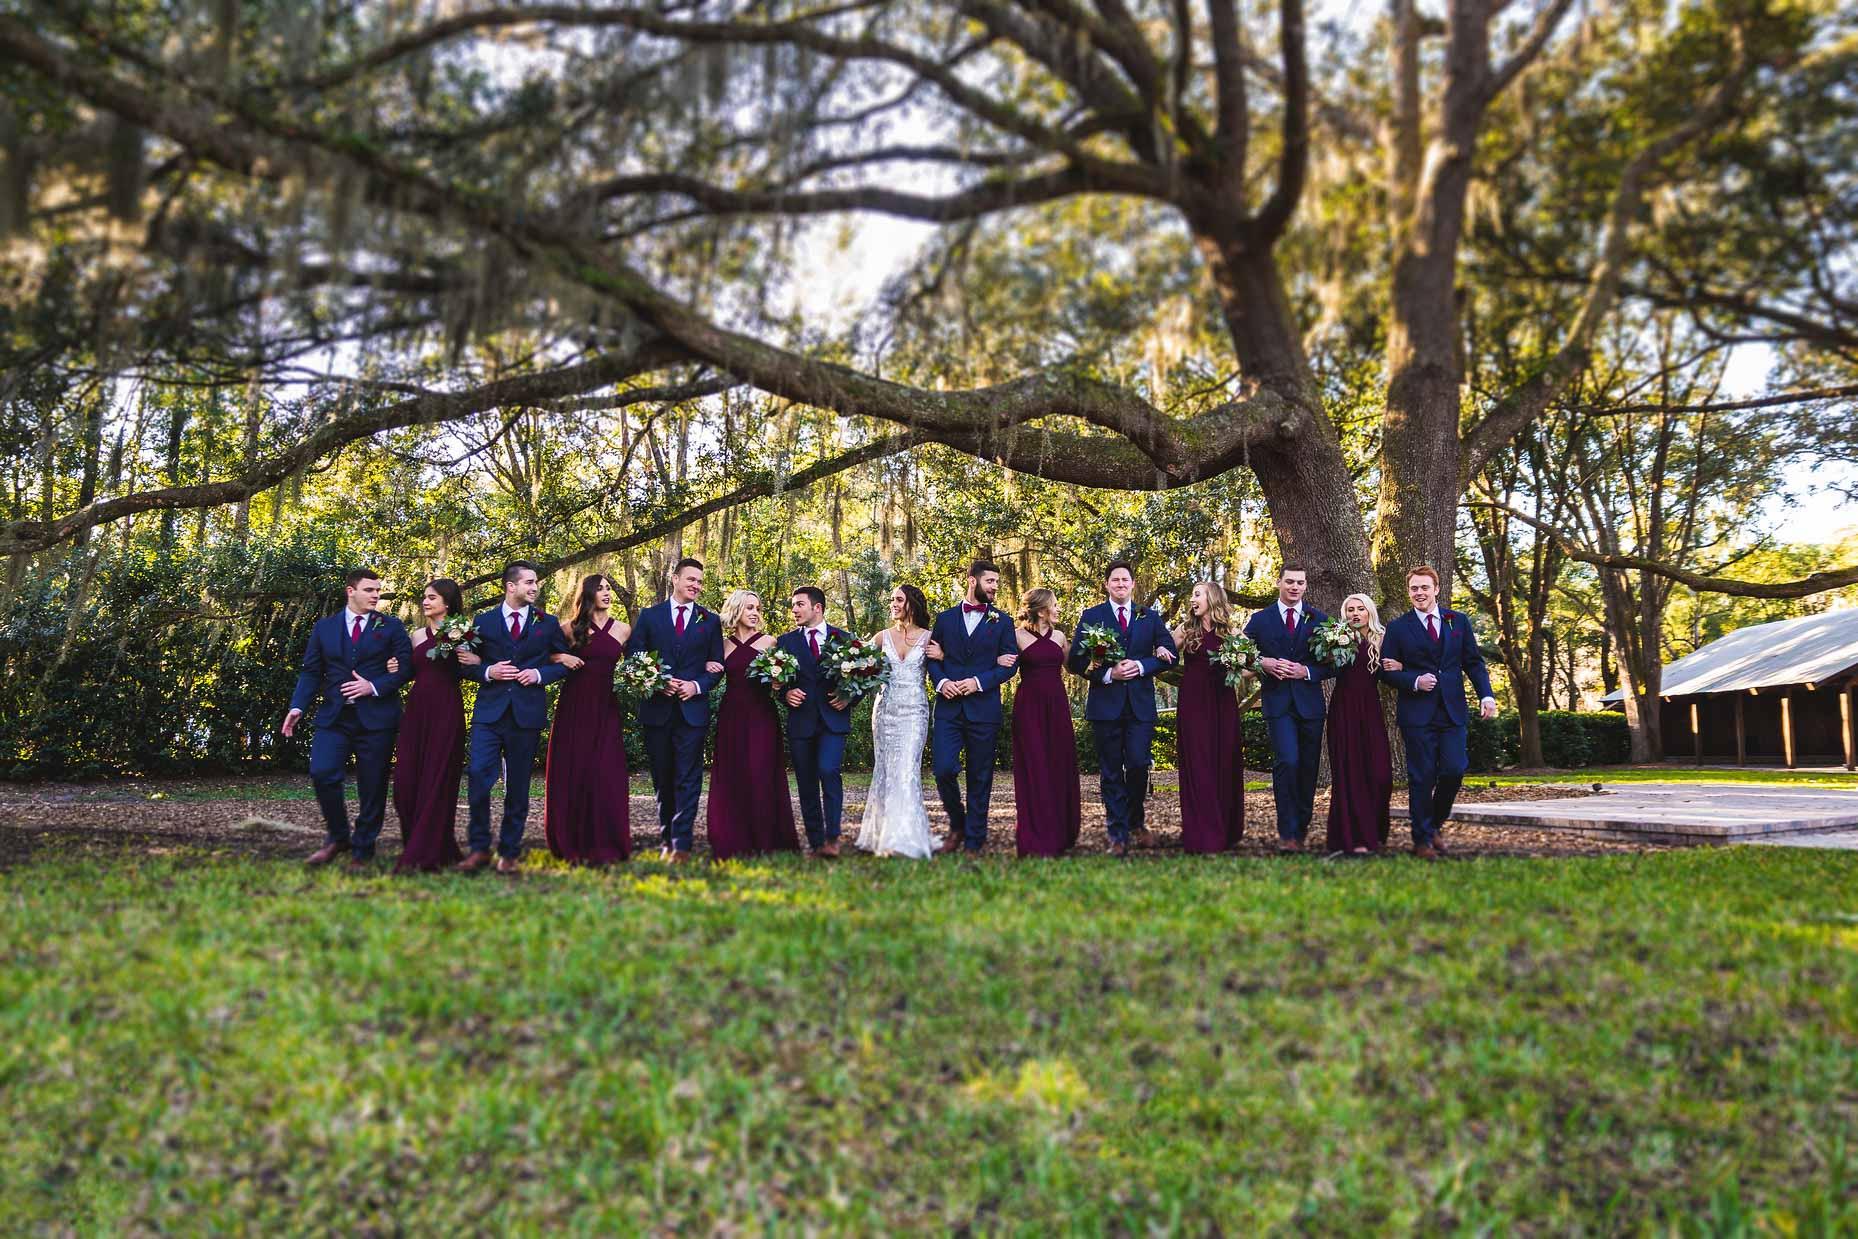 adam-szarmack-bowing-oaks-wedding-photographer-jacksonville-9.jpg